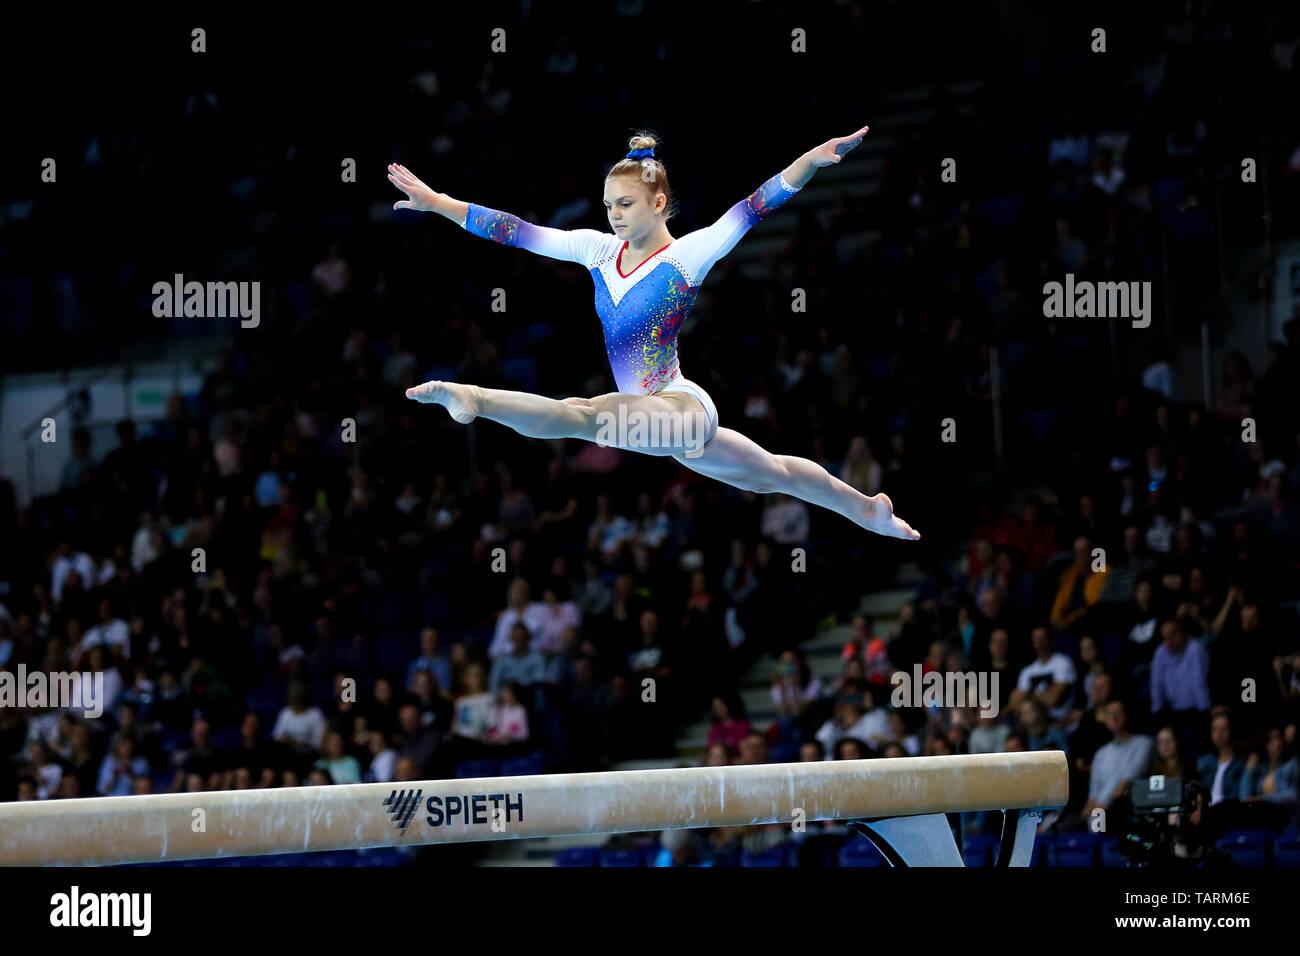 Szczecin, Poland, April 14, 2019: Romanian gymnast Denisa Golgota in action during the 8th European Championships in Artistic Gymnastics in Szczecin. - Stock Image